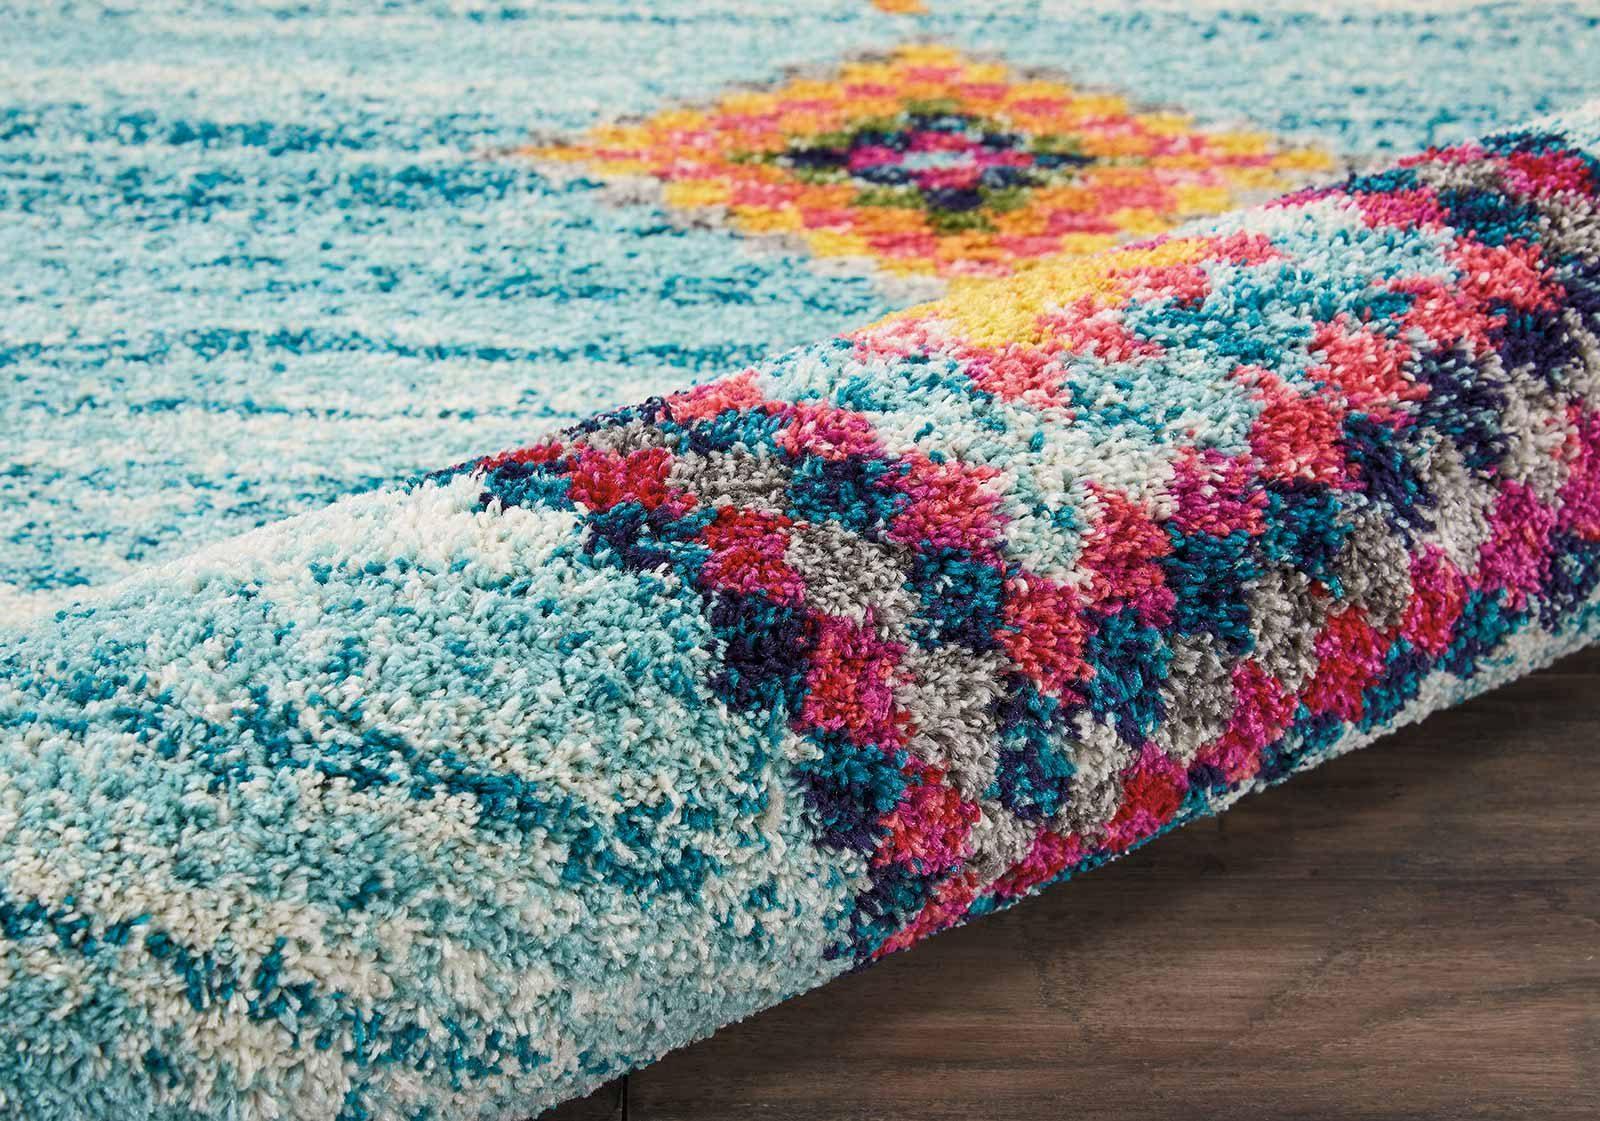 Andessi tapijt Nomad NMD04 AQUA 8x11 099446461506 TX01